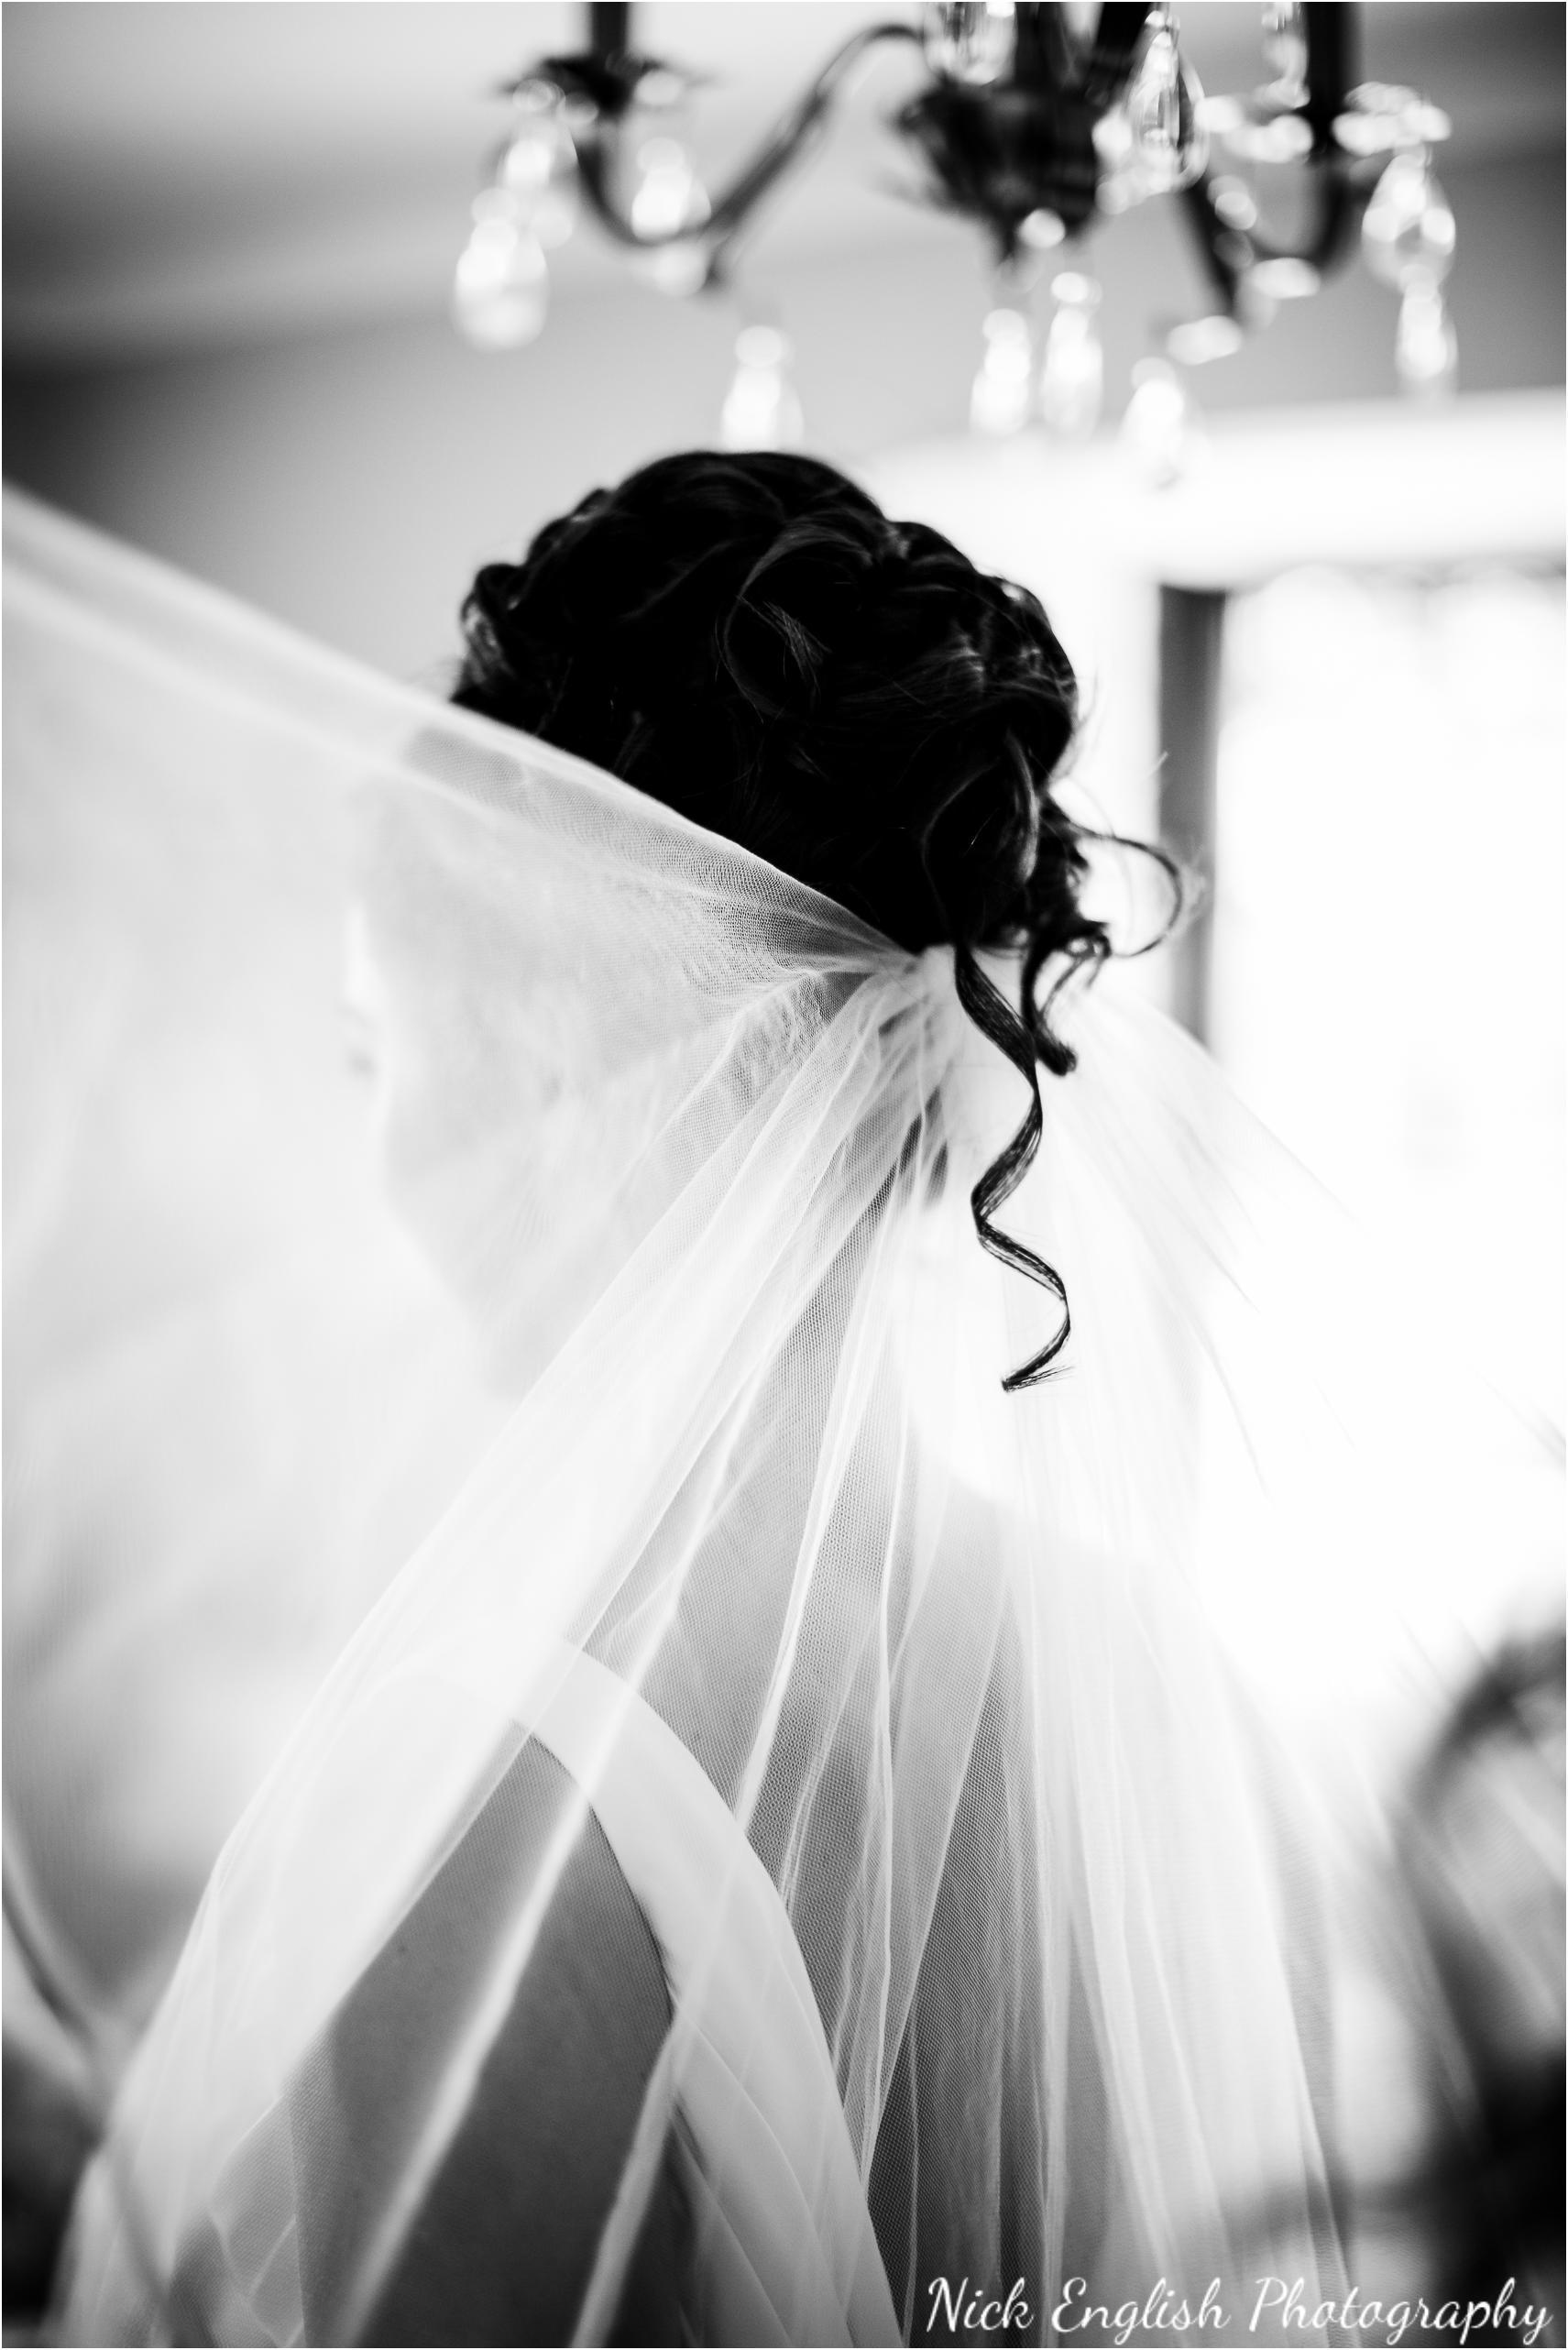 Emily David Wedding Photographs at Barton Grange Preston by Nick English Photography 32jpg.jpeg